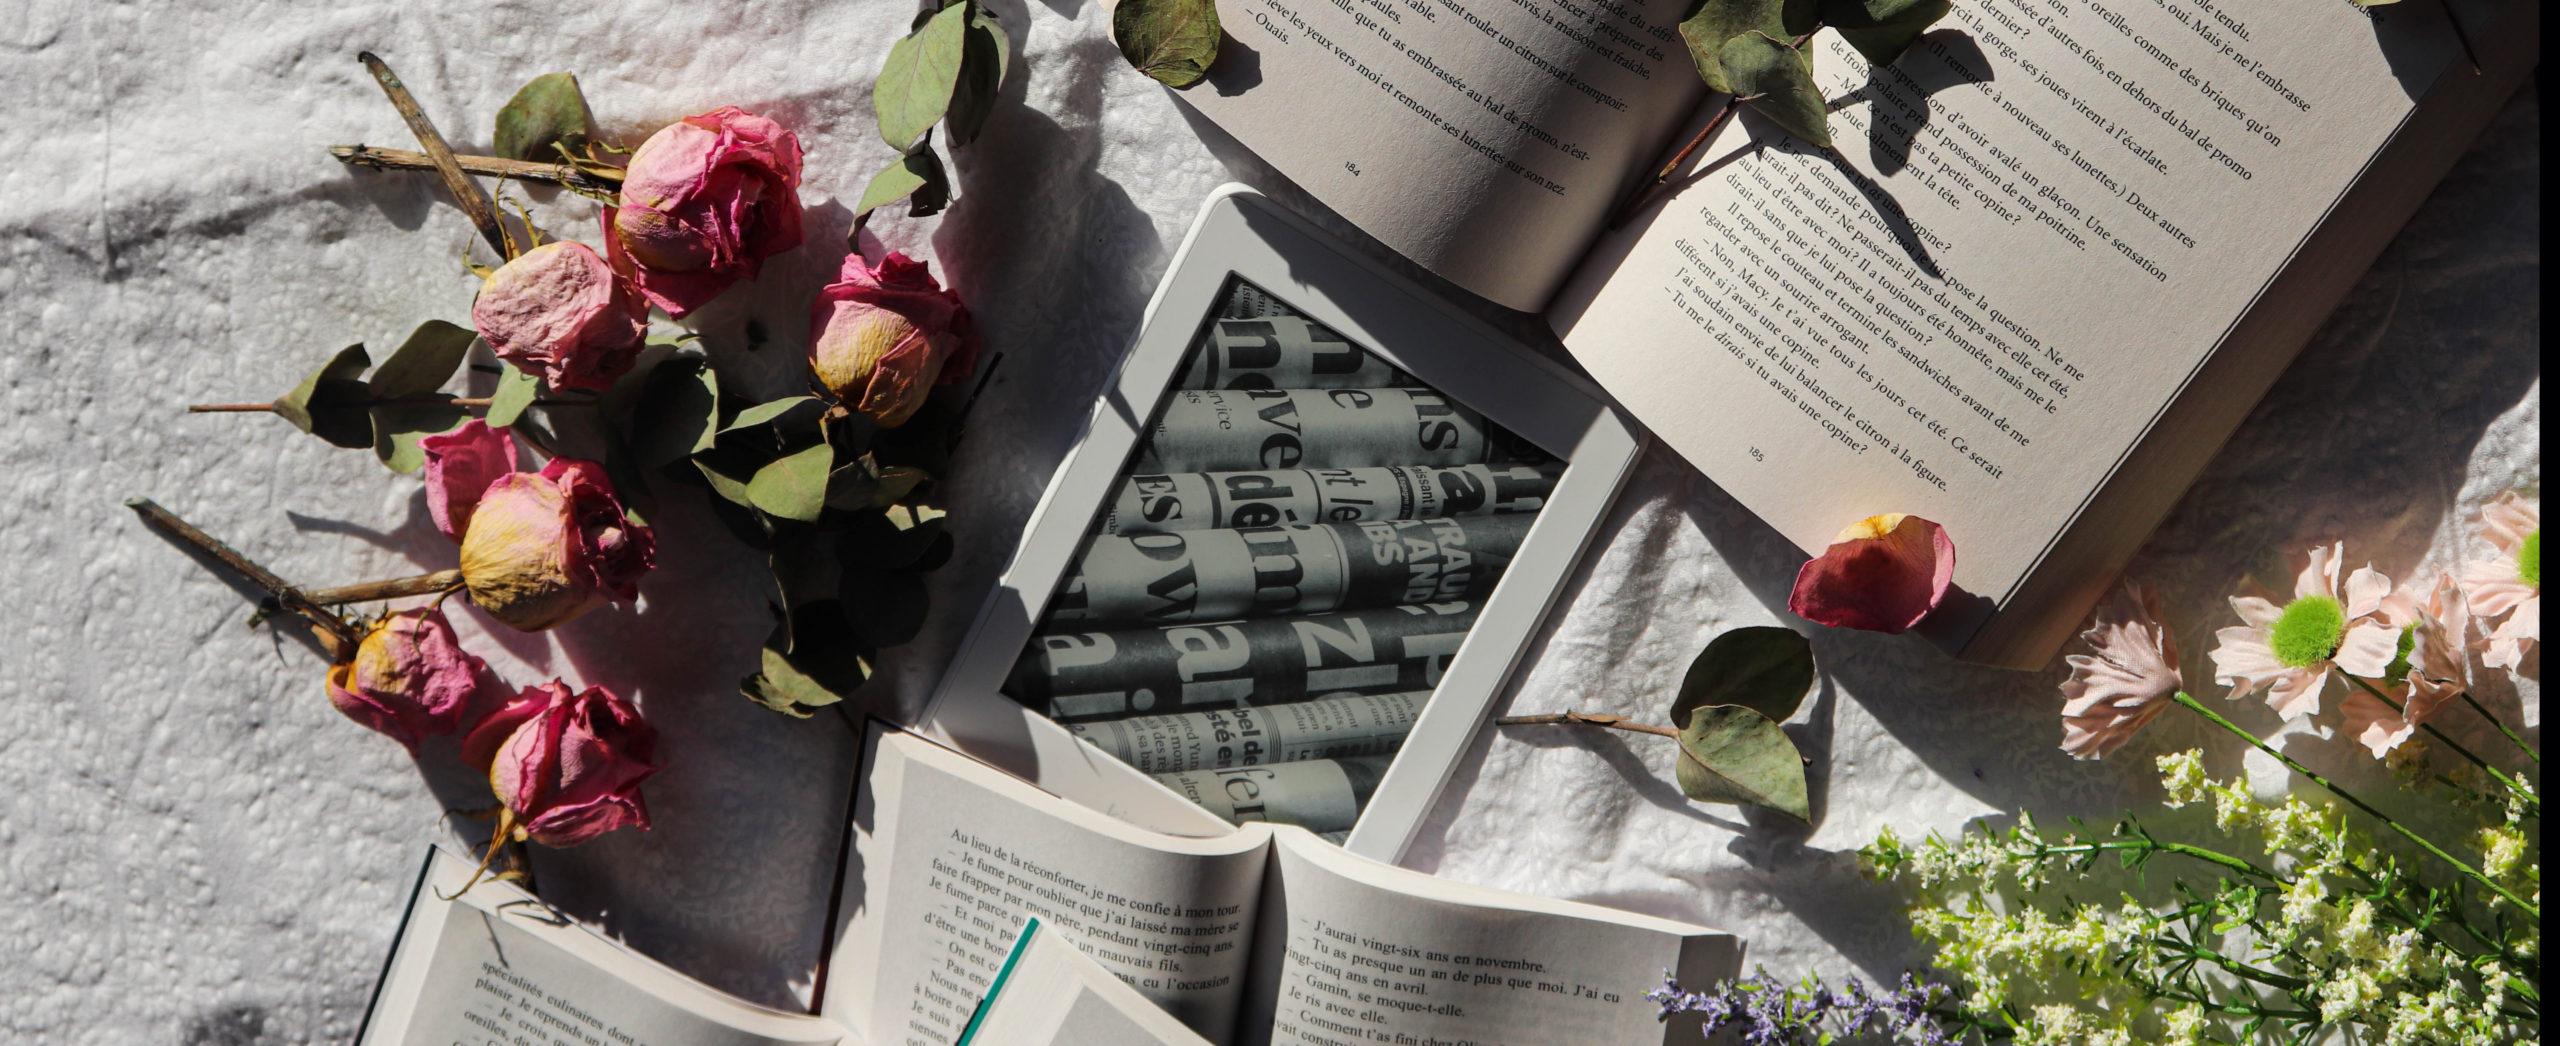 livres, liseuses et roses